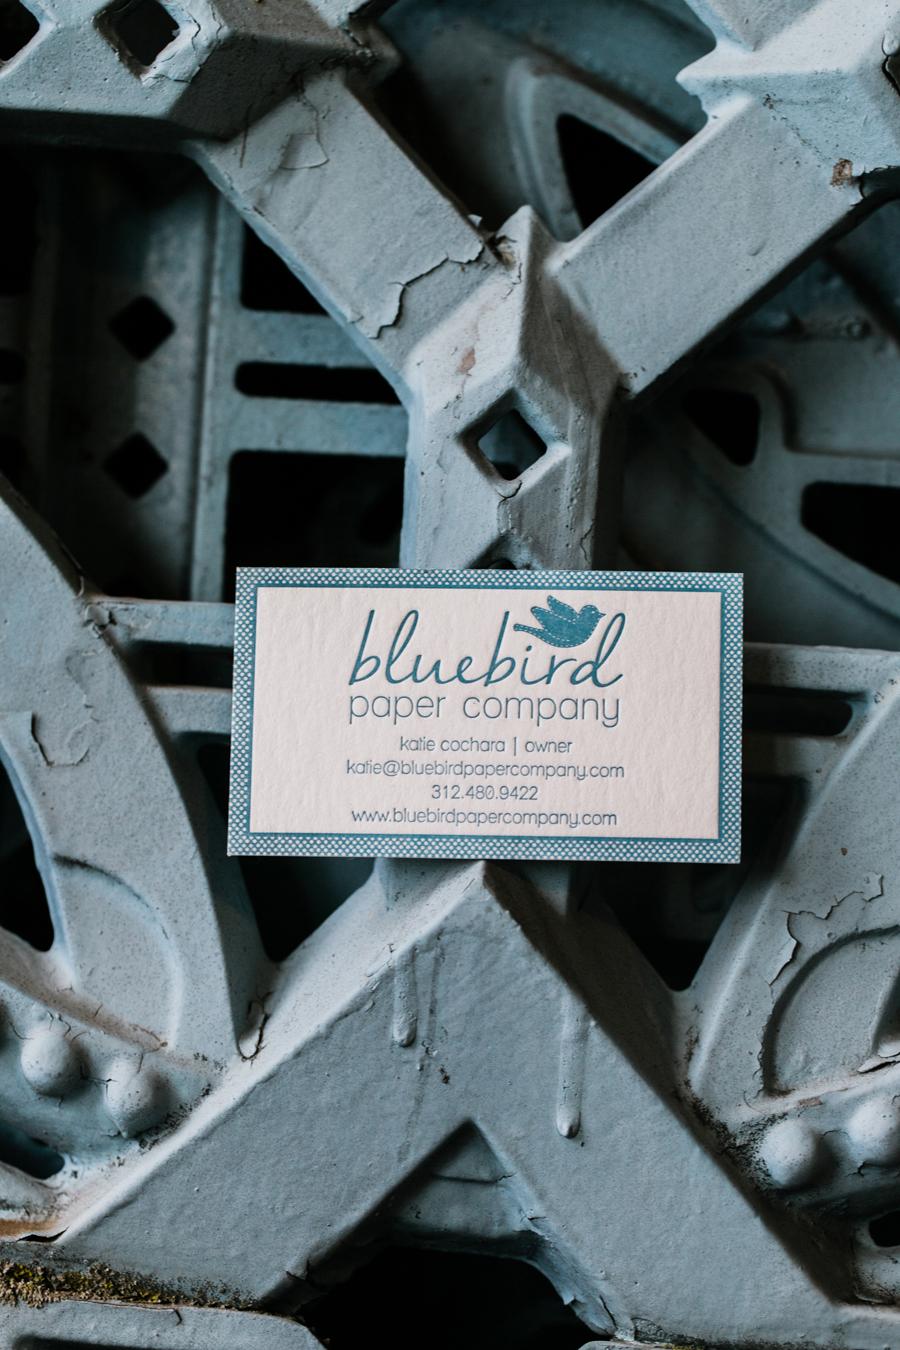 bluebird-paper-company-009